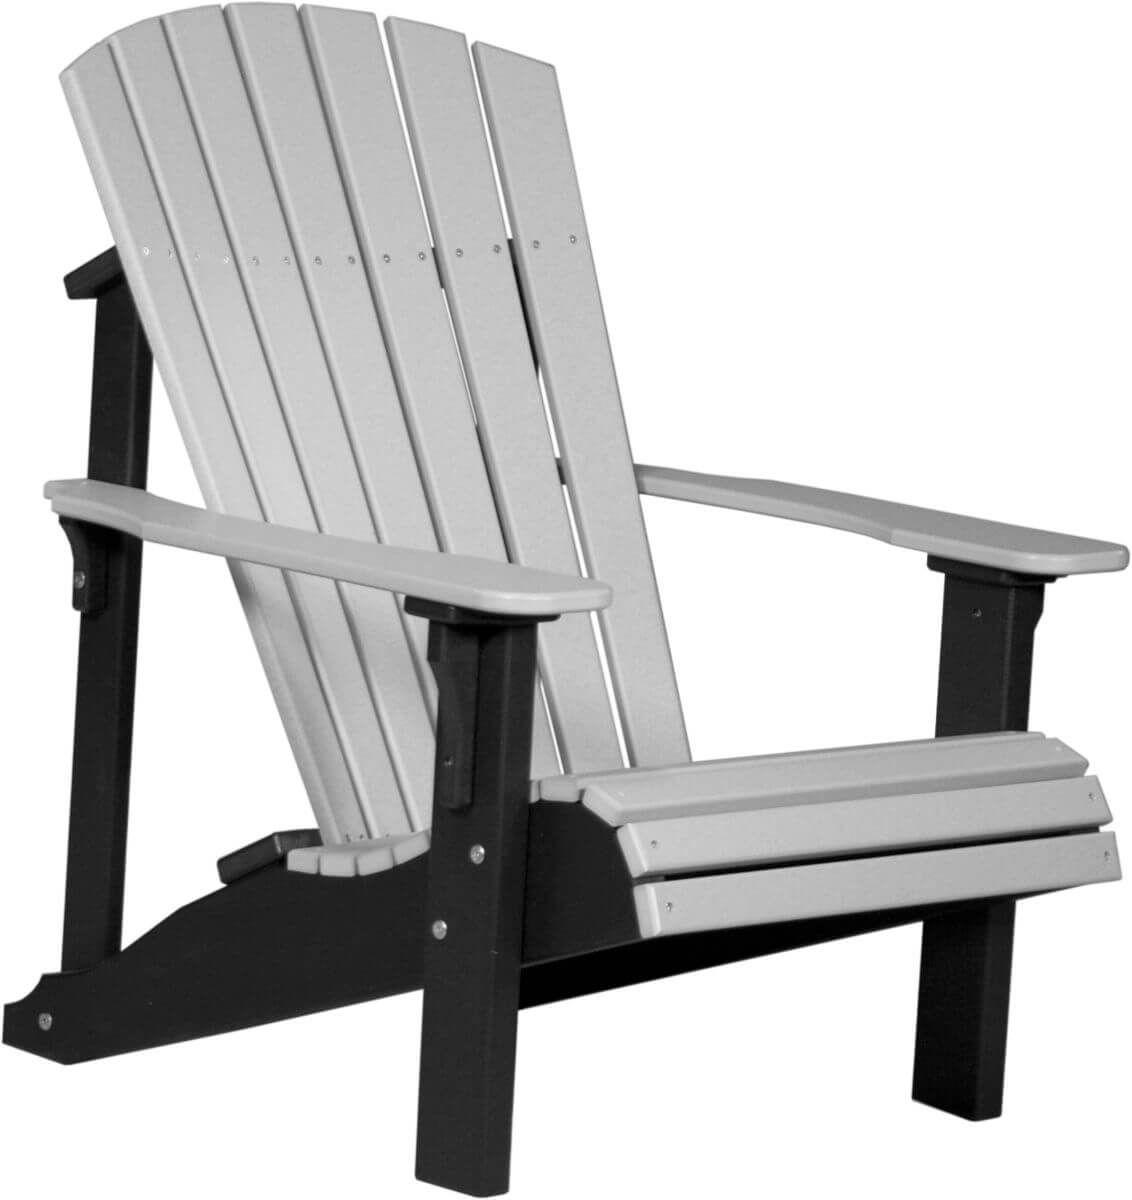 Dove Gray and Black Rockaway Adirondack Chair